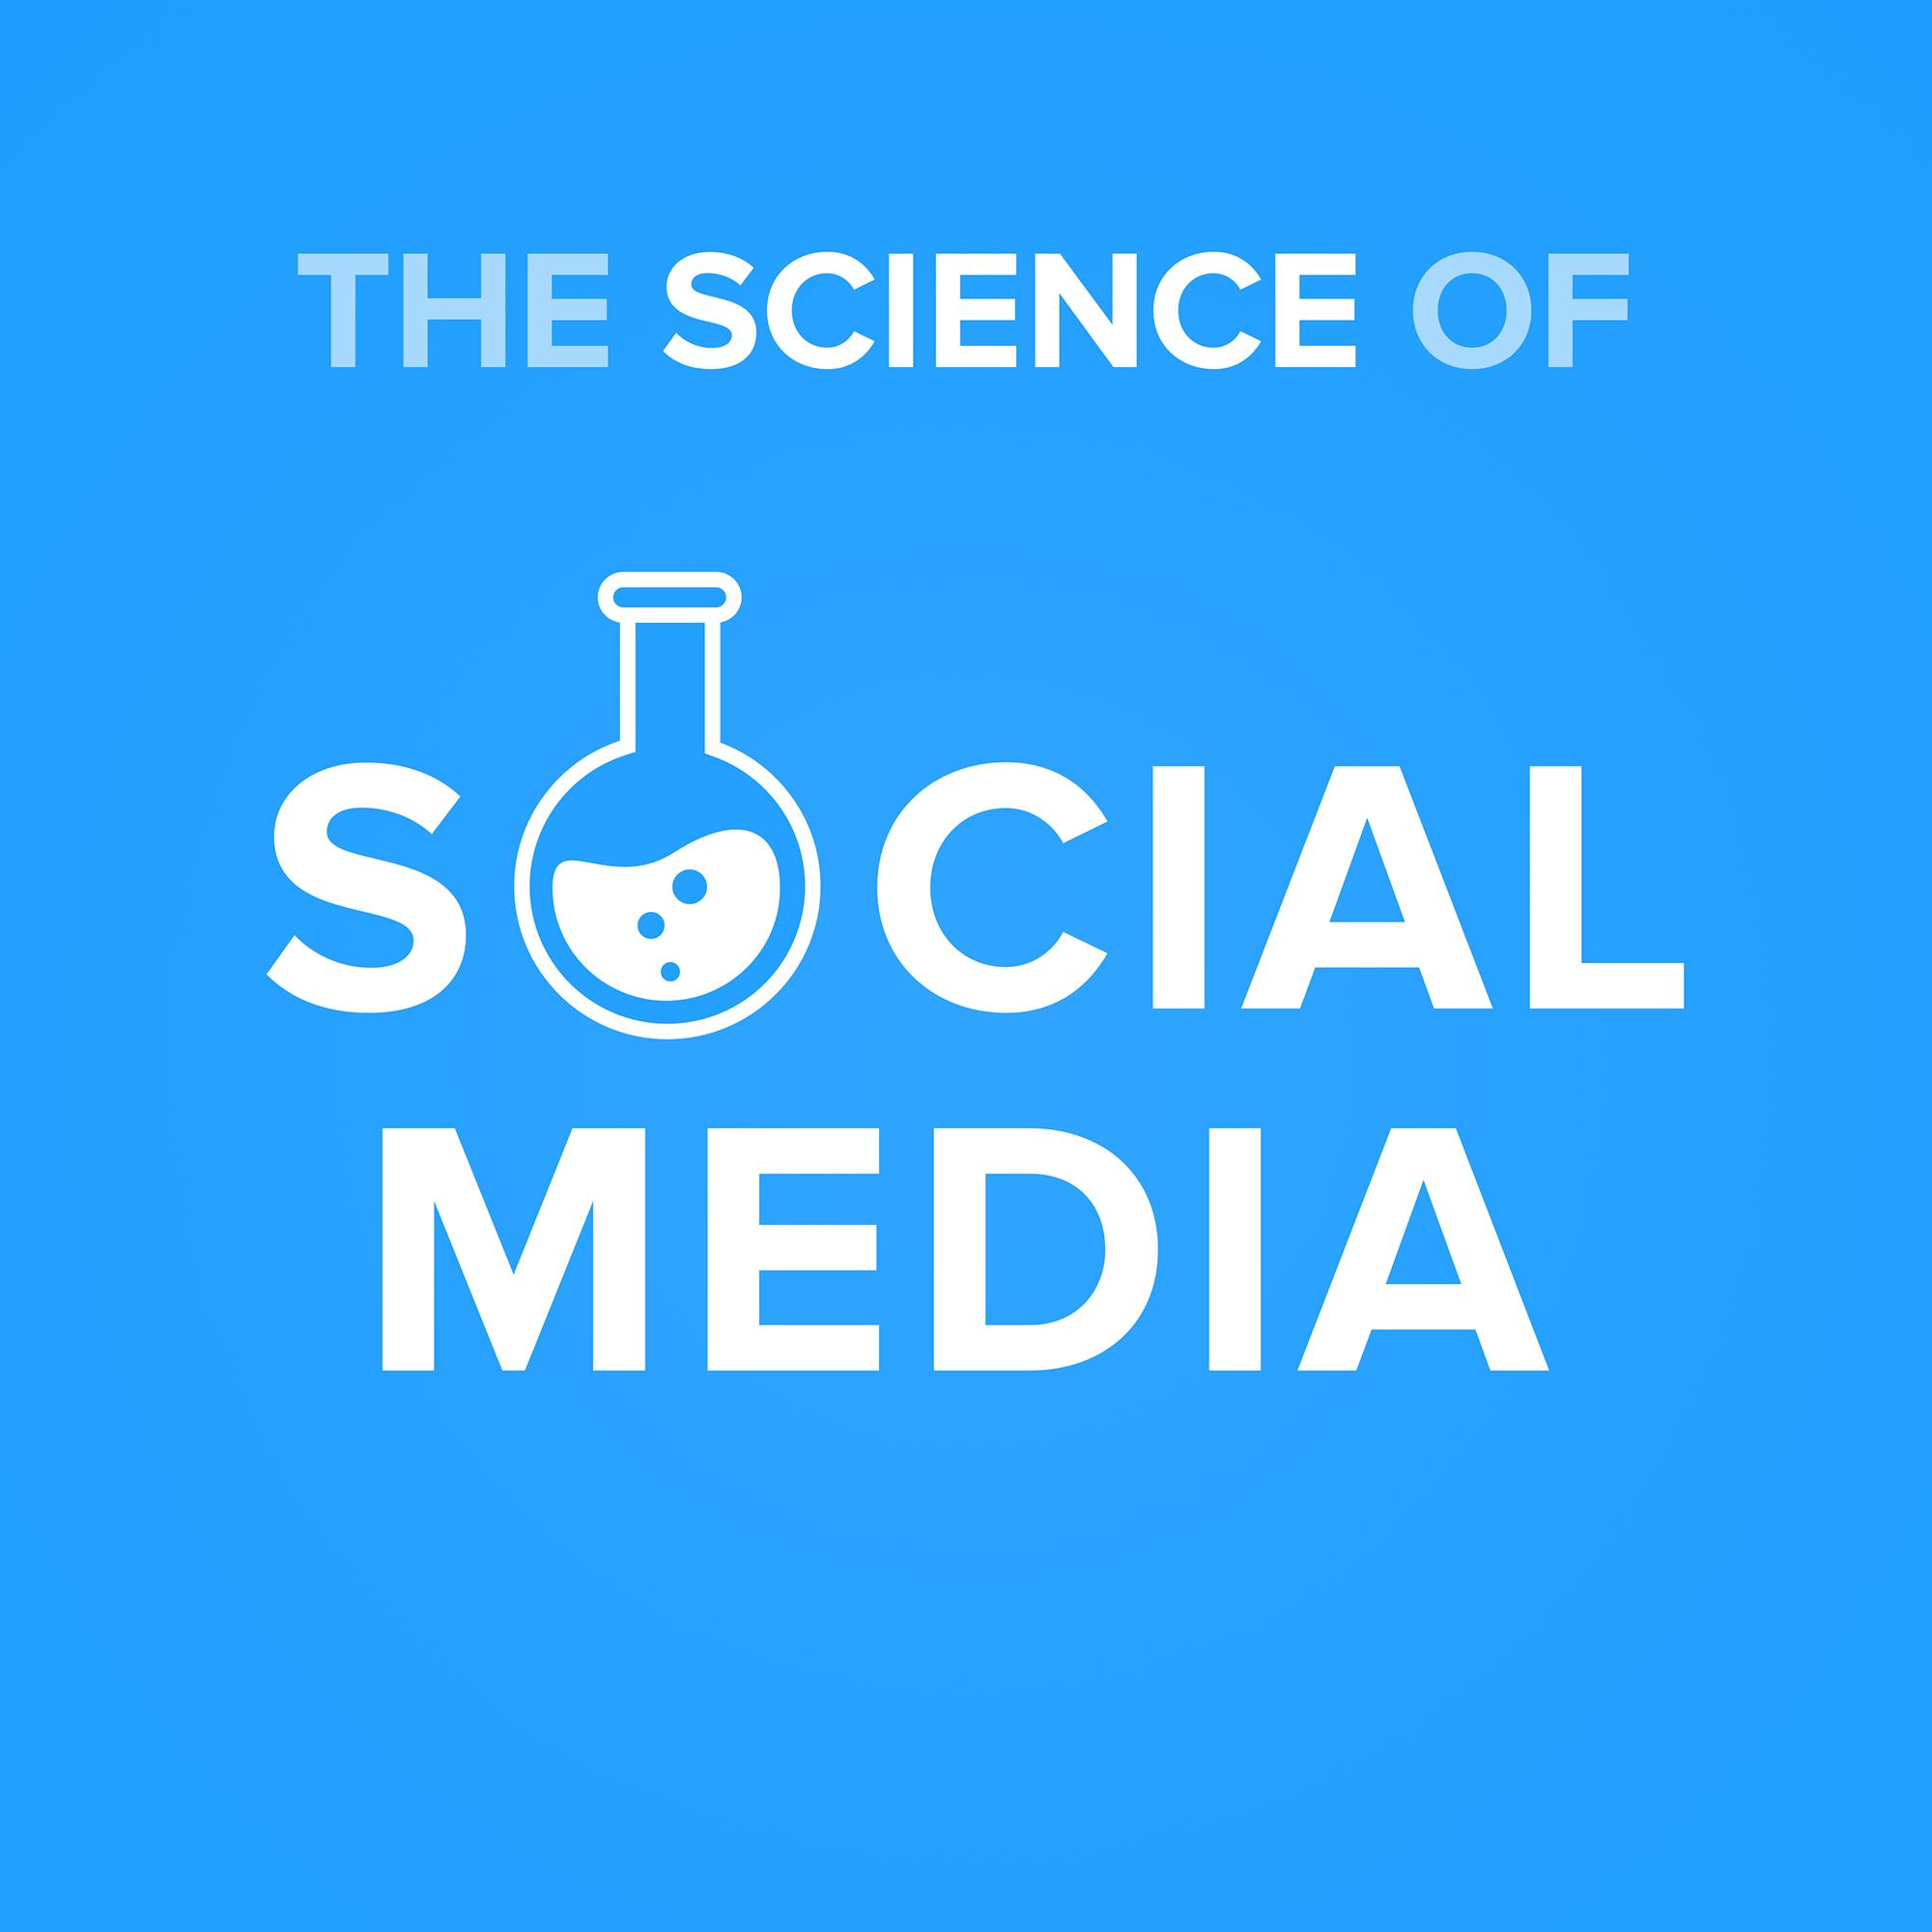 Science-of-Social-Media-logo.png